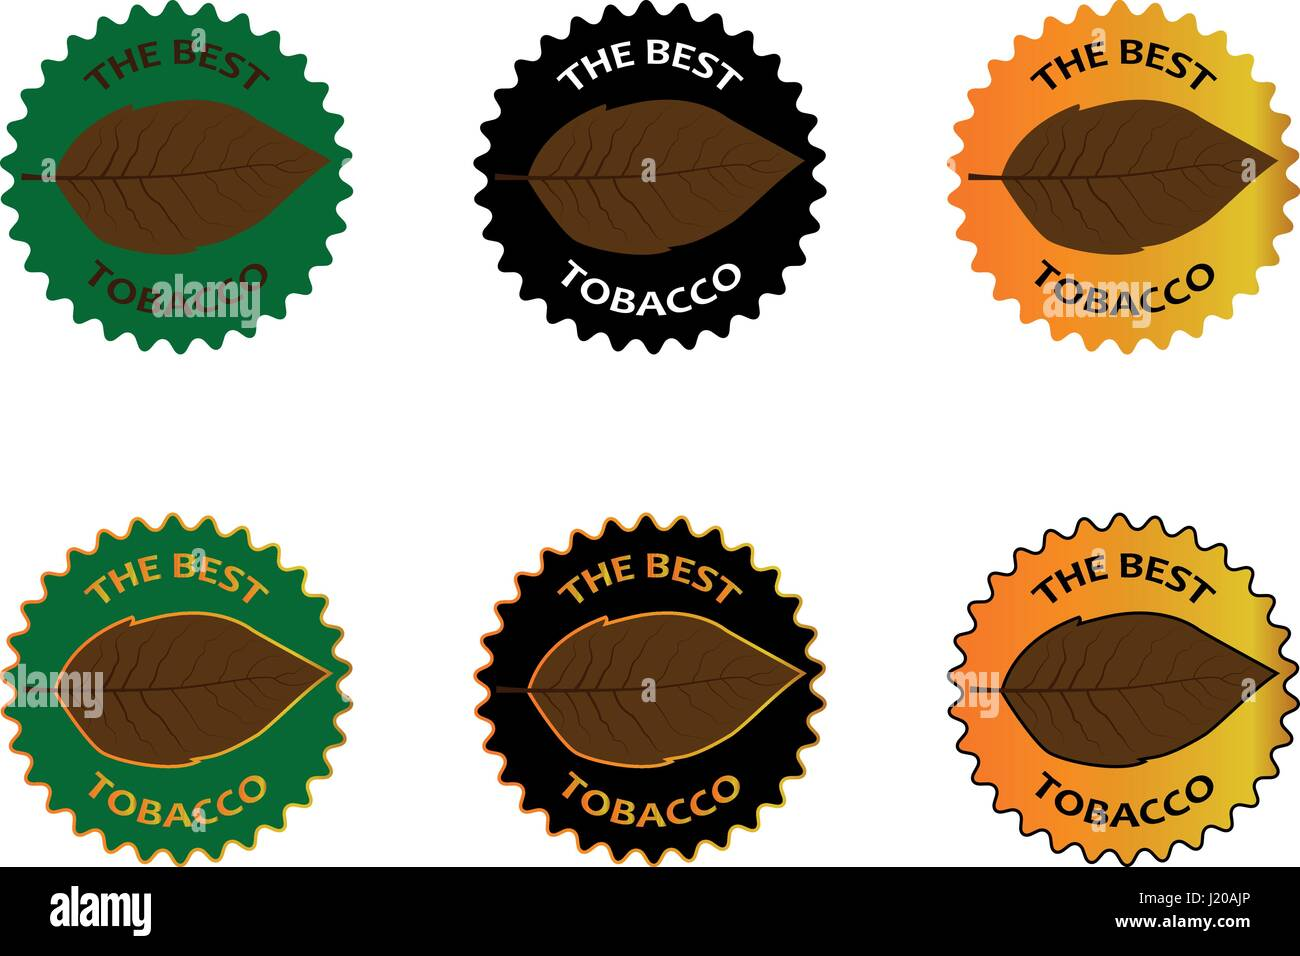 tobacco the best sticker - vector illustration - Stock Vector